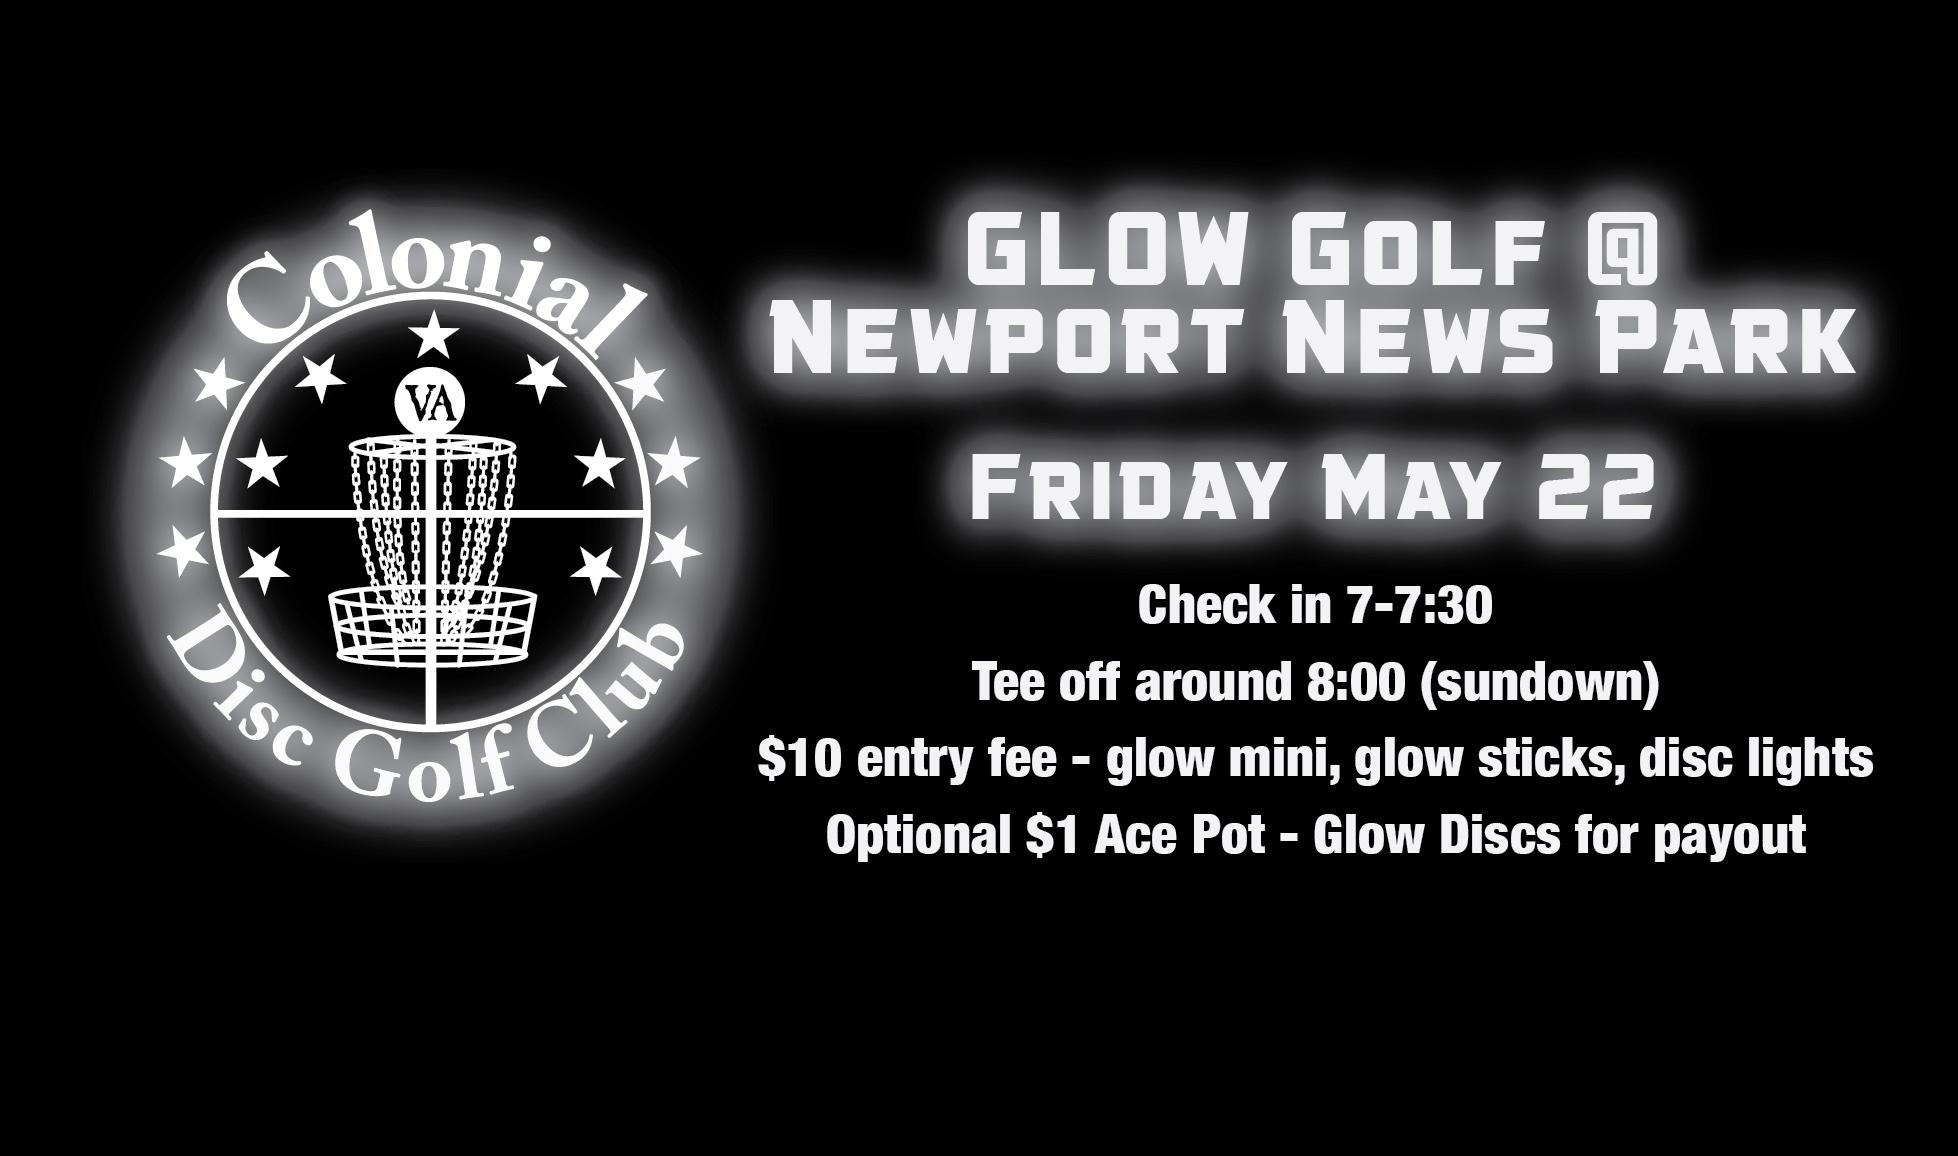 Glow Golf @ Newport News Park